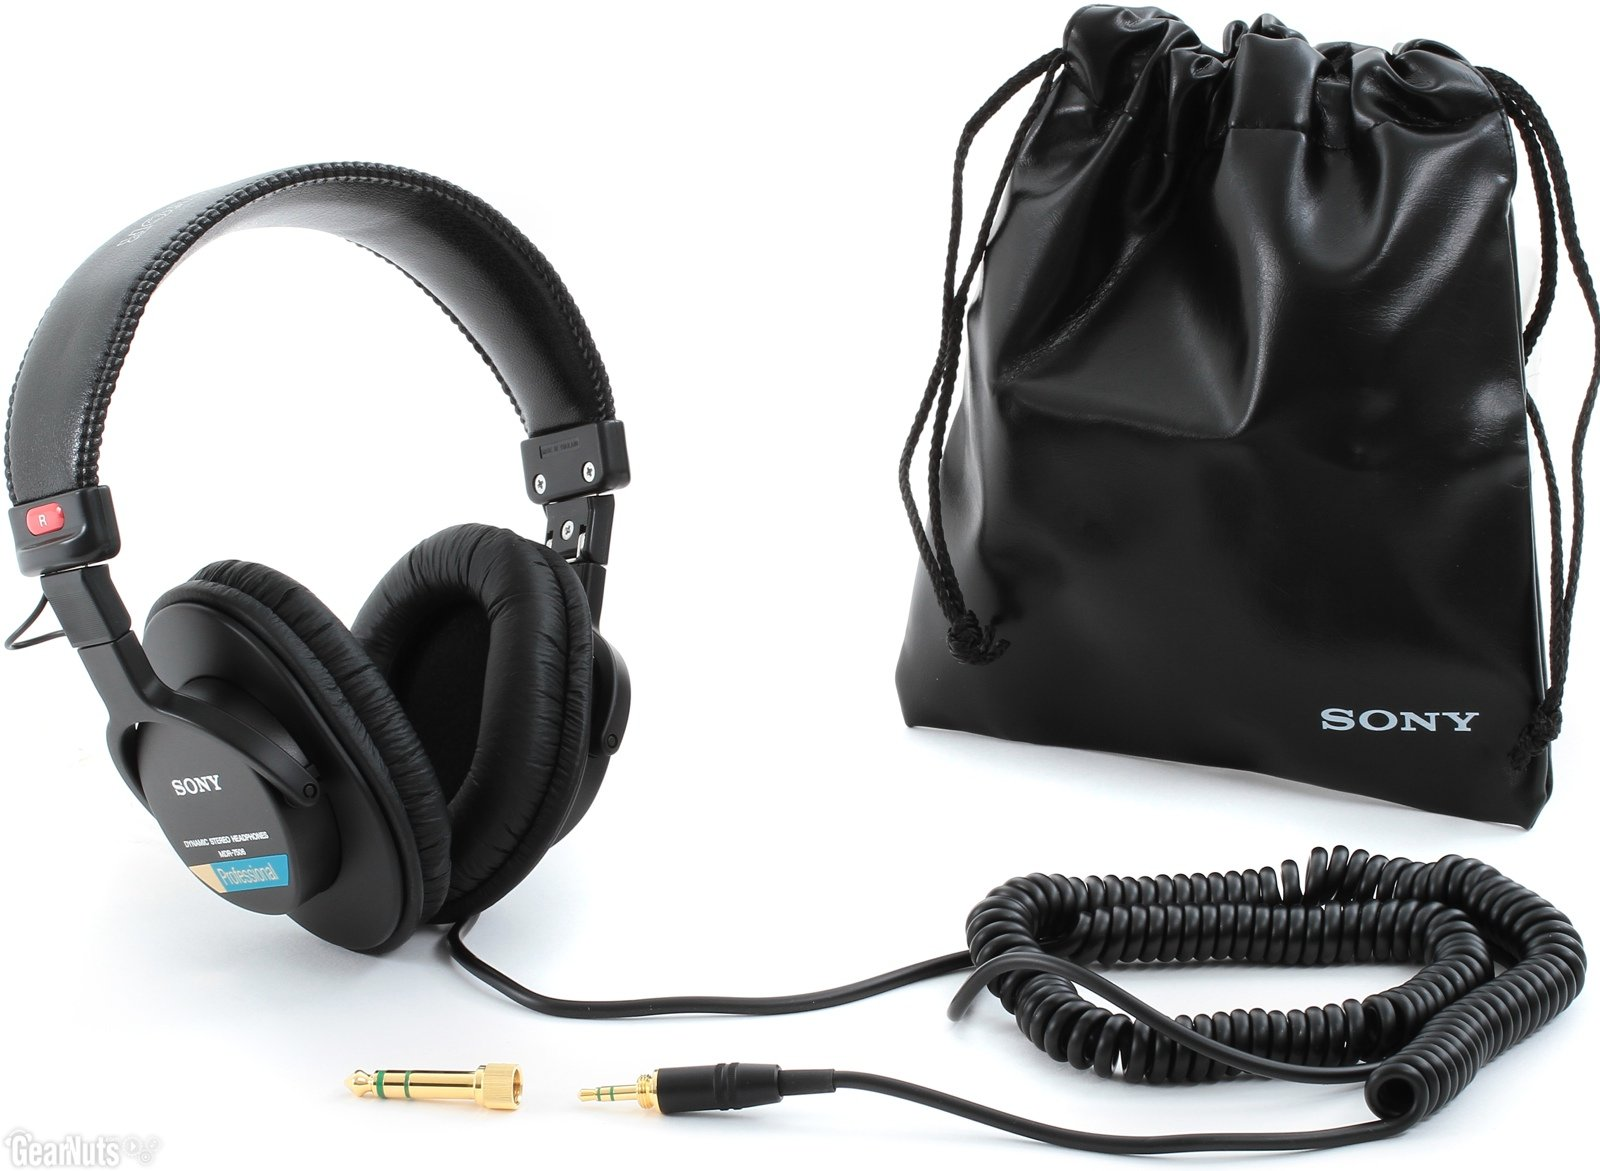 Sony Auriculares para DJ (4334205465)